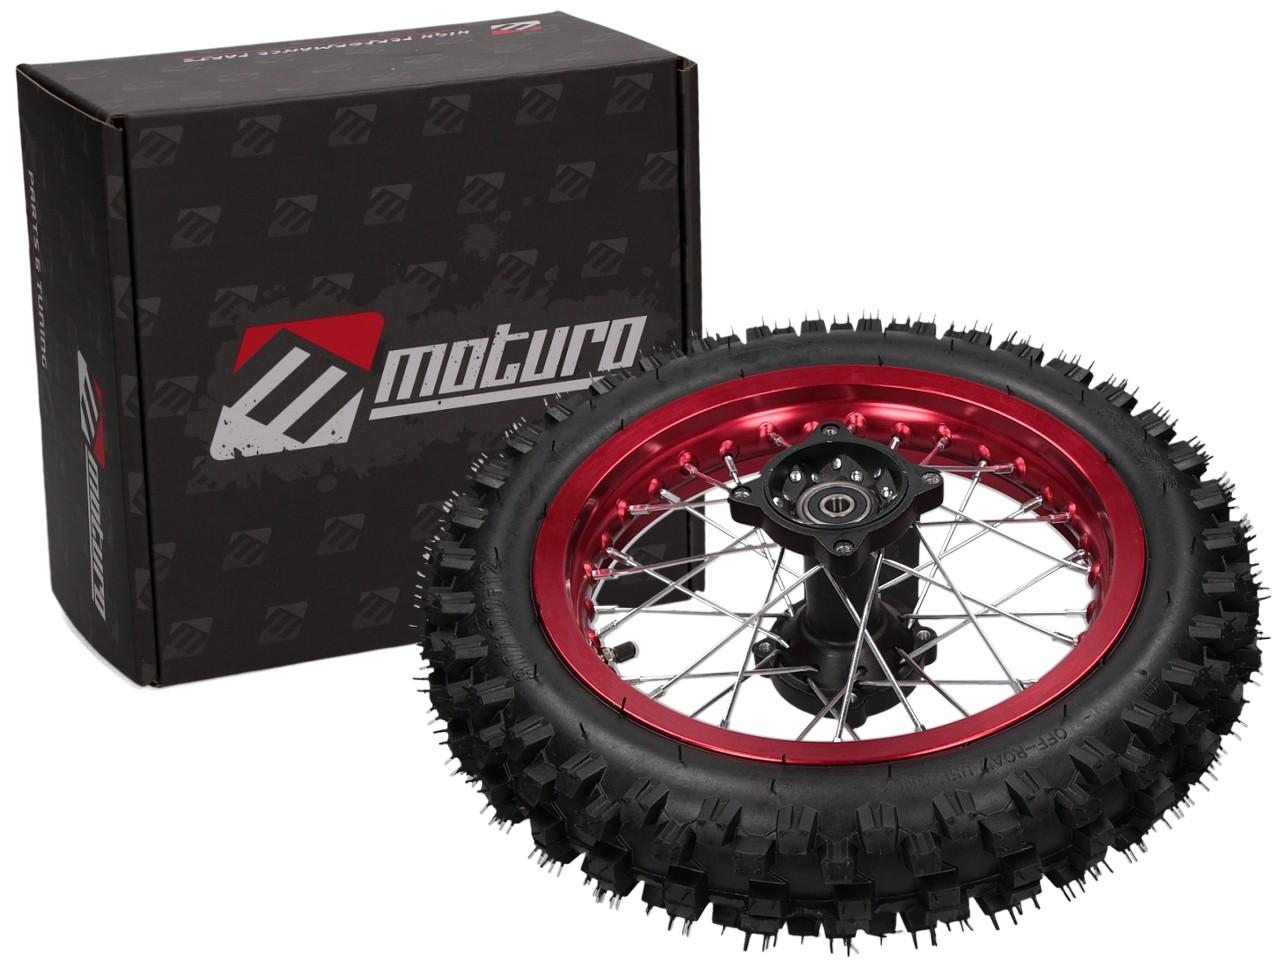 moturo komplettrad hinten 12 rot f r dirt bike agb29. Black Bedroom Furniture Sets. Home Design Ideas